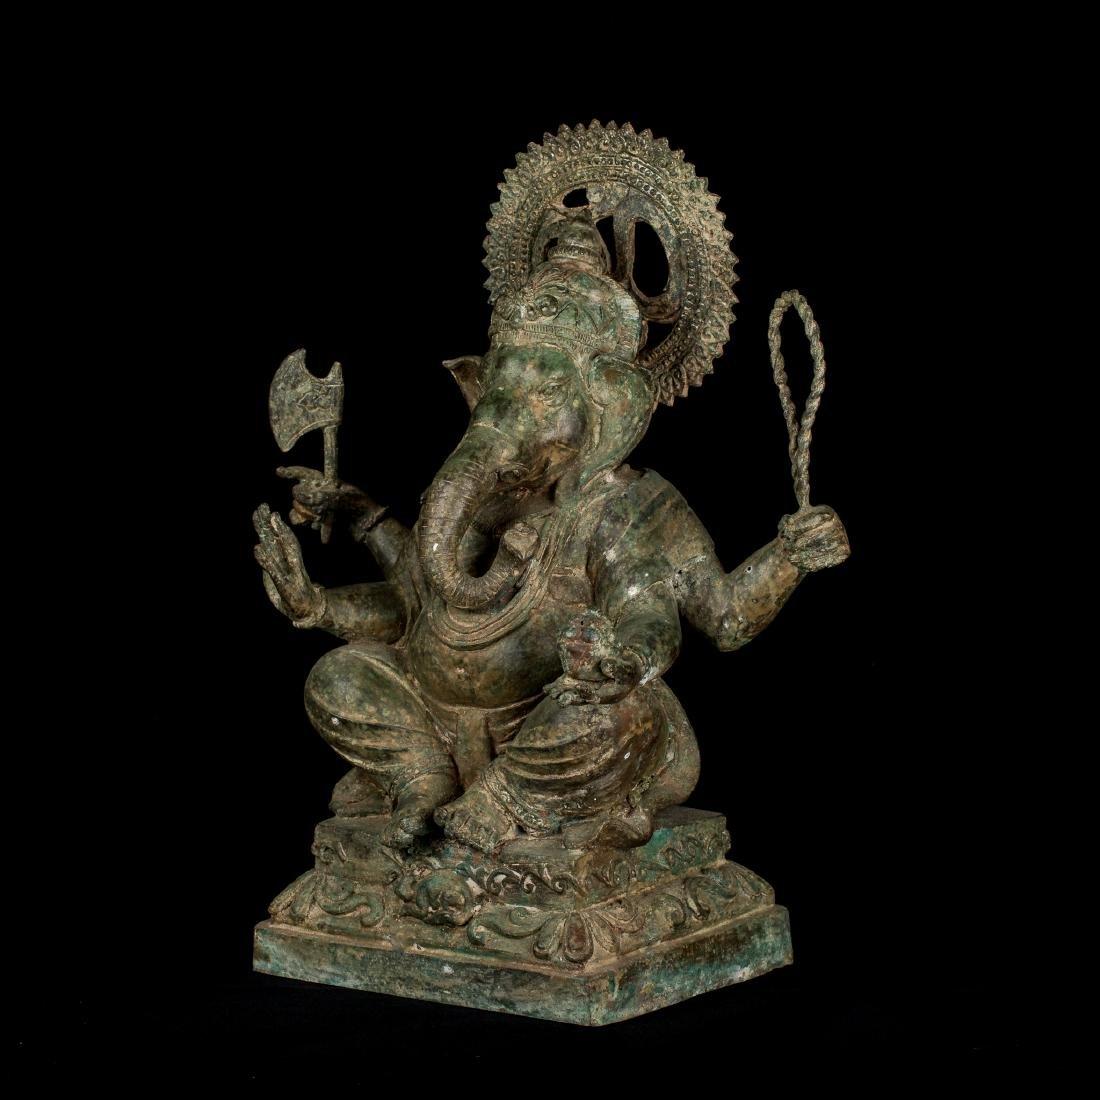 19th Century Antique Seated Bronze Ganesha Statue - 2